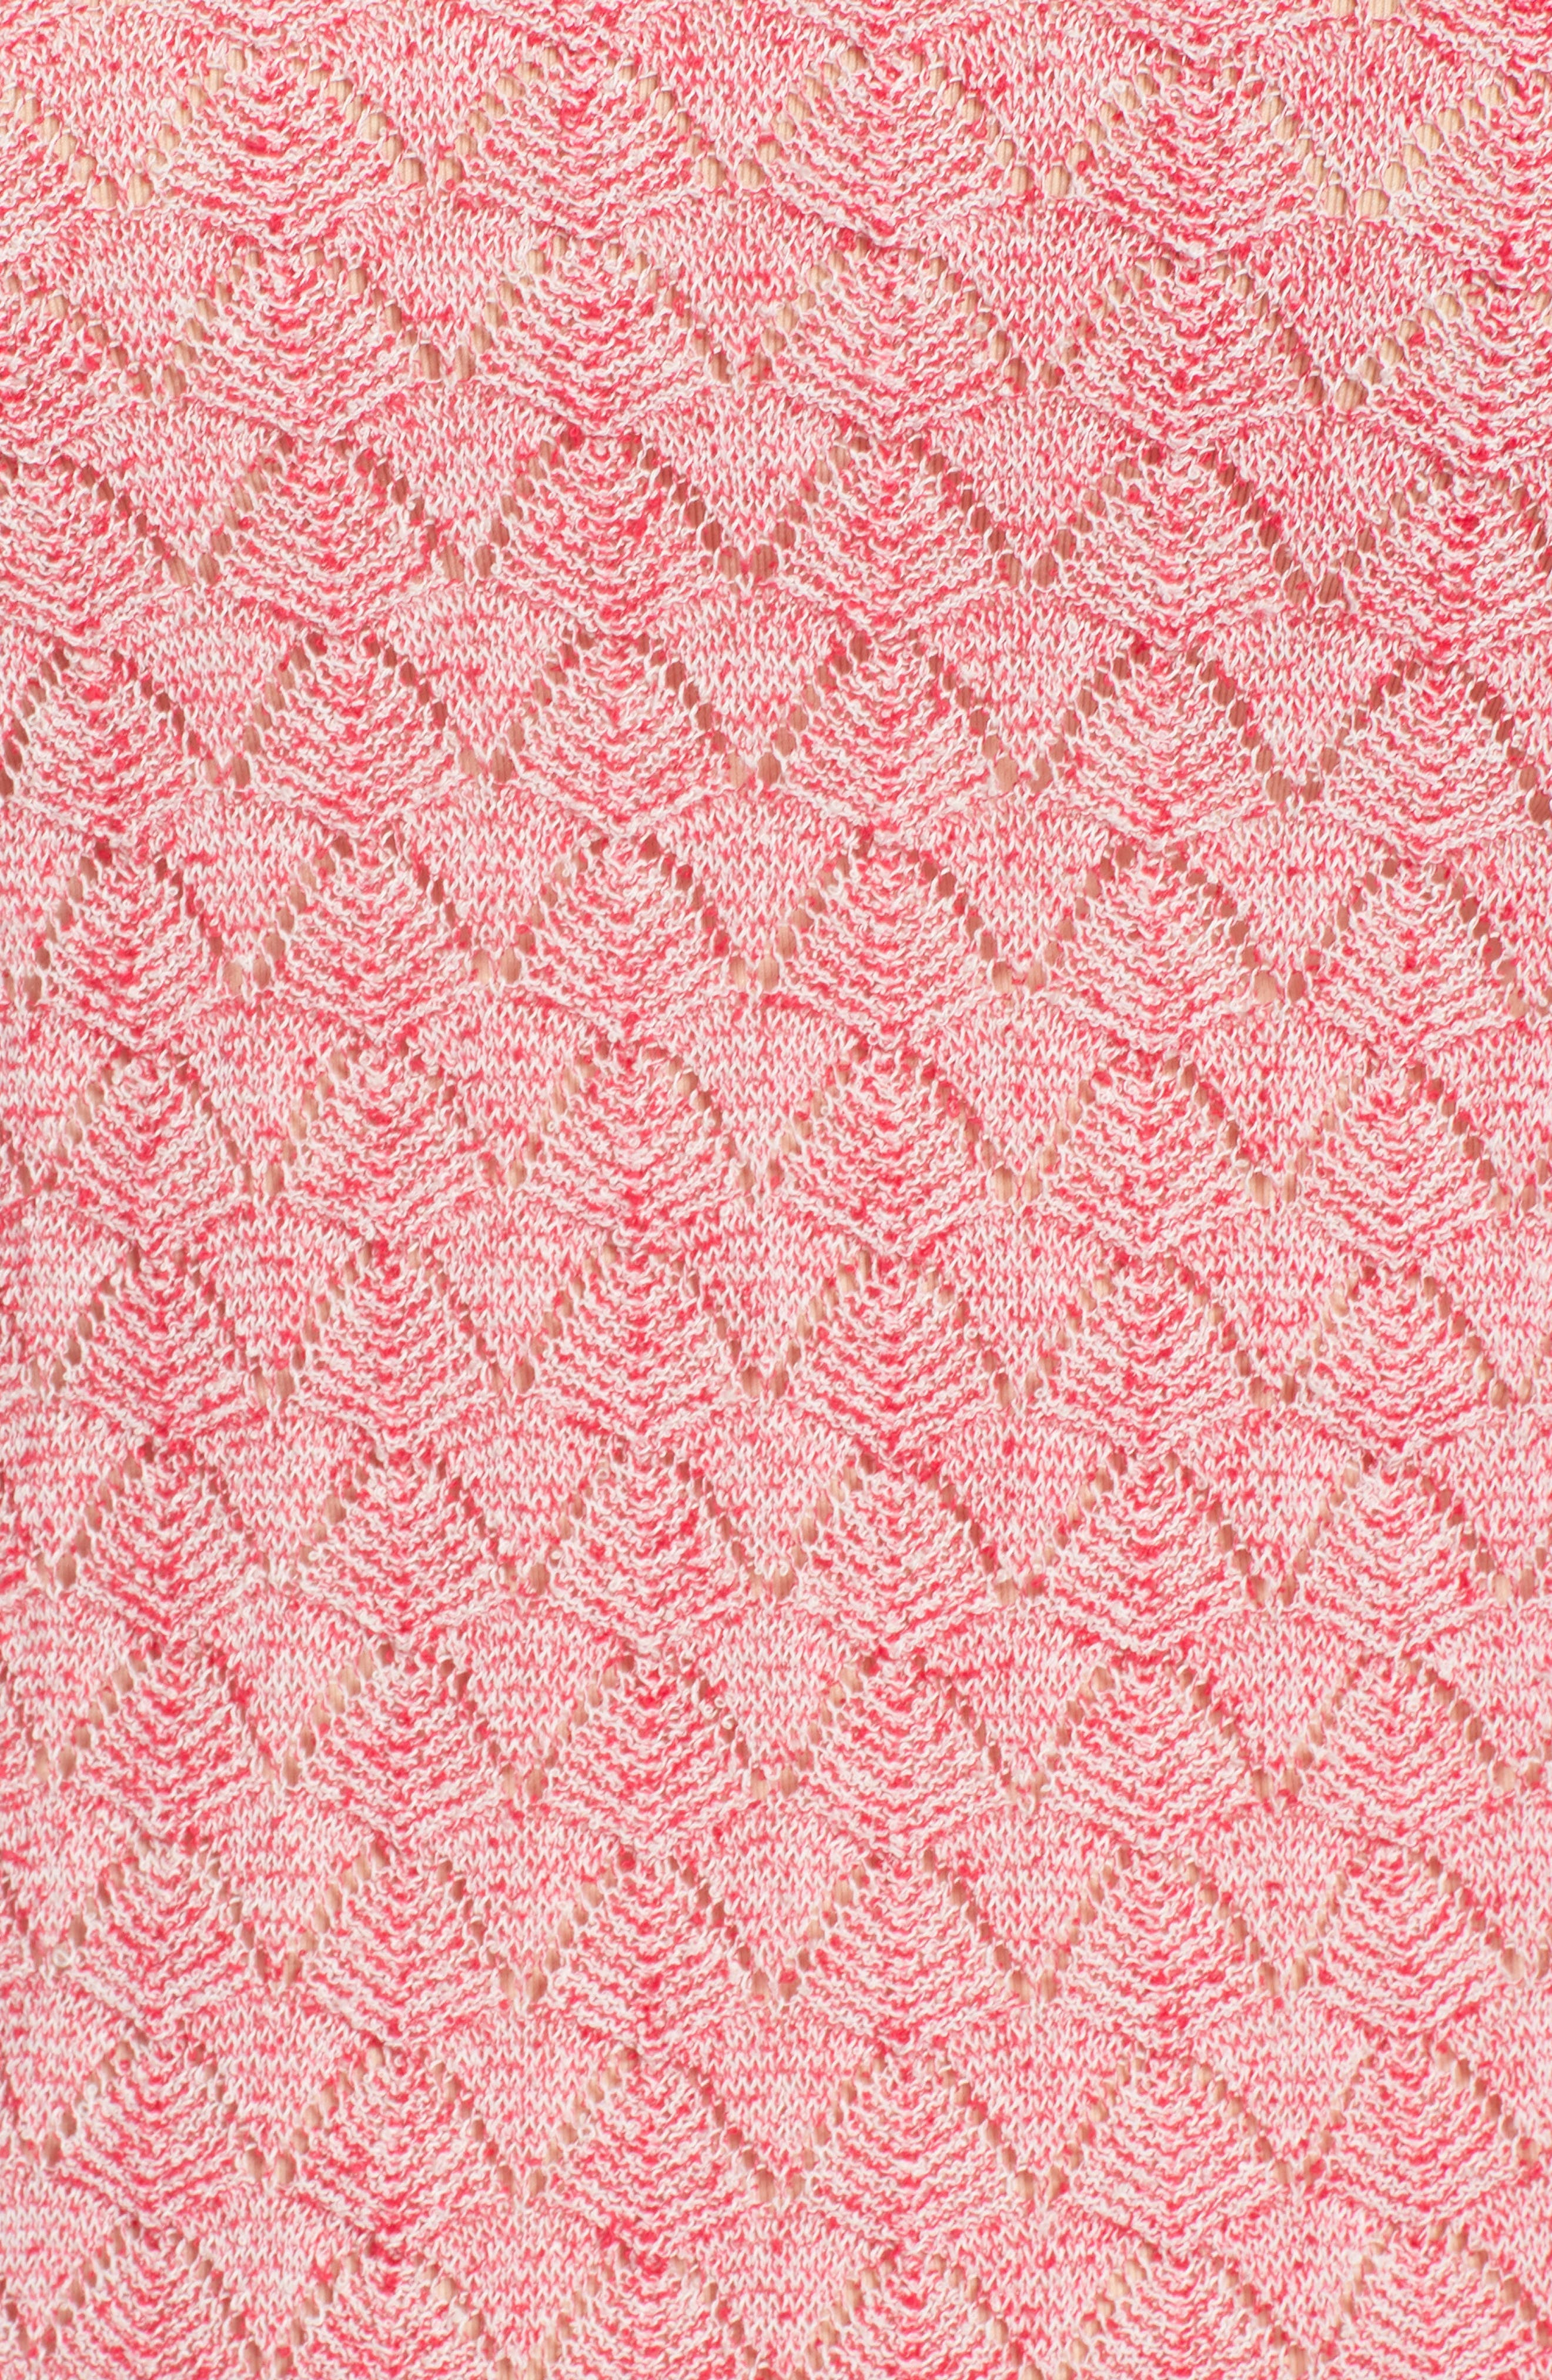 Basket Weave Sweater,                             Alternate thumbnail 6, color,                             Lychee Fantasy